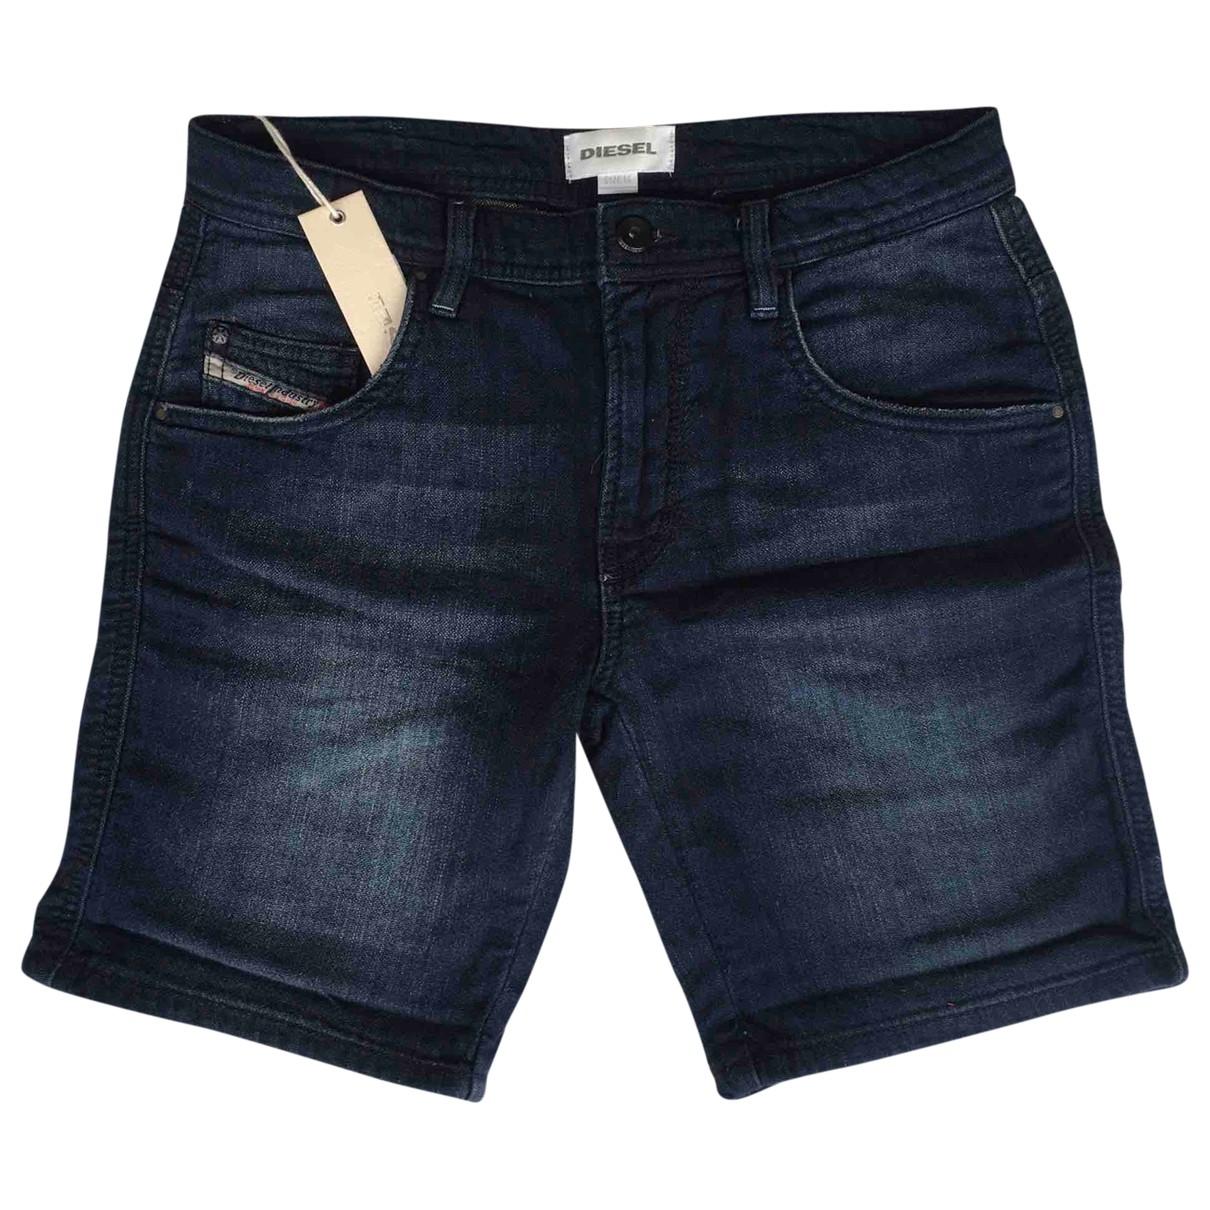 Diesel \N Blue Denim - Jeans Shorts for Kids 14 years - S FR